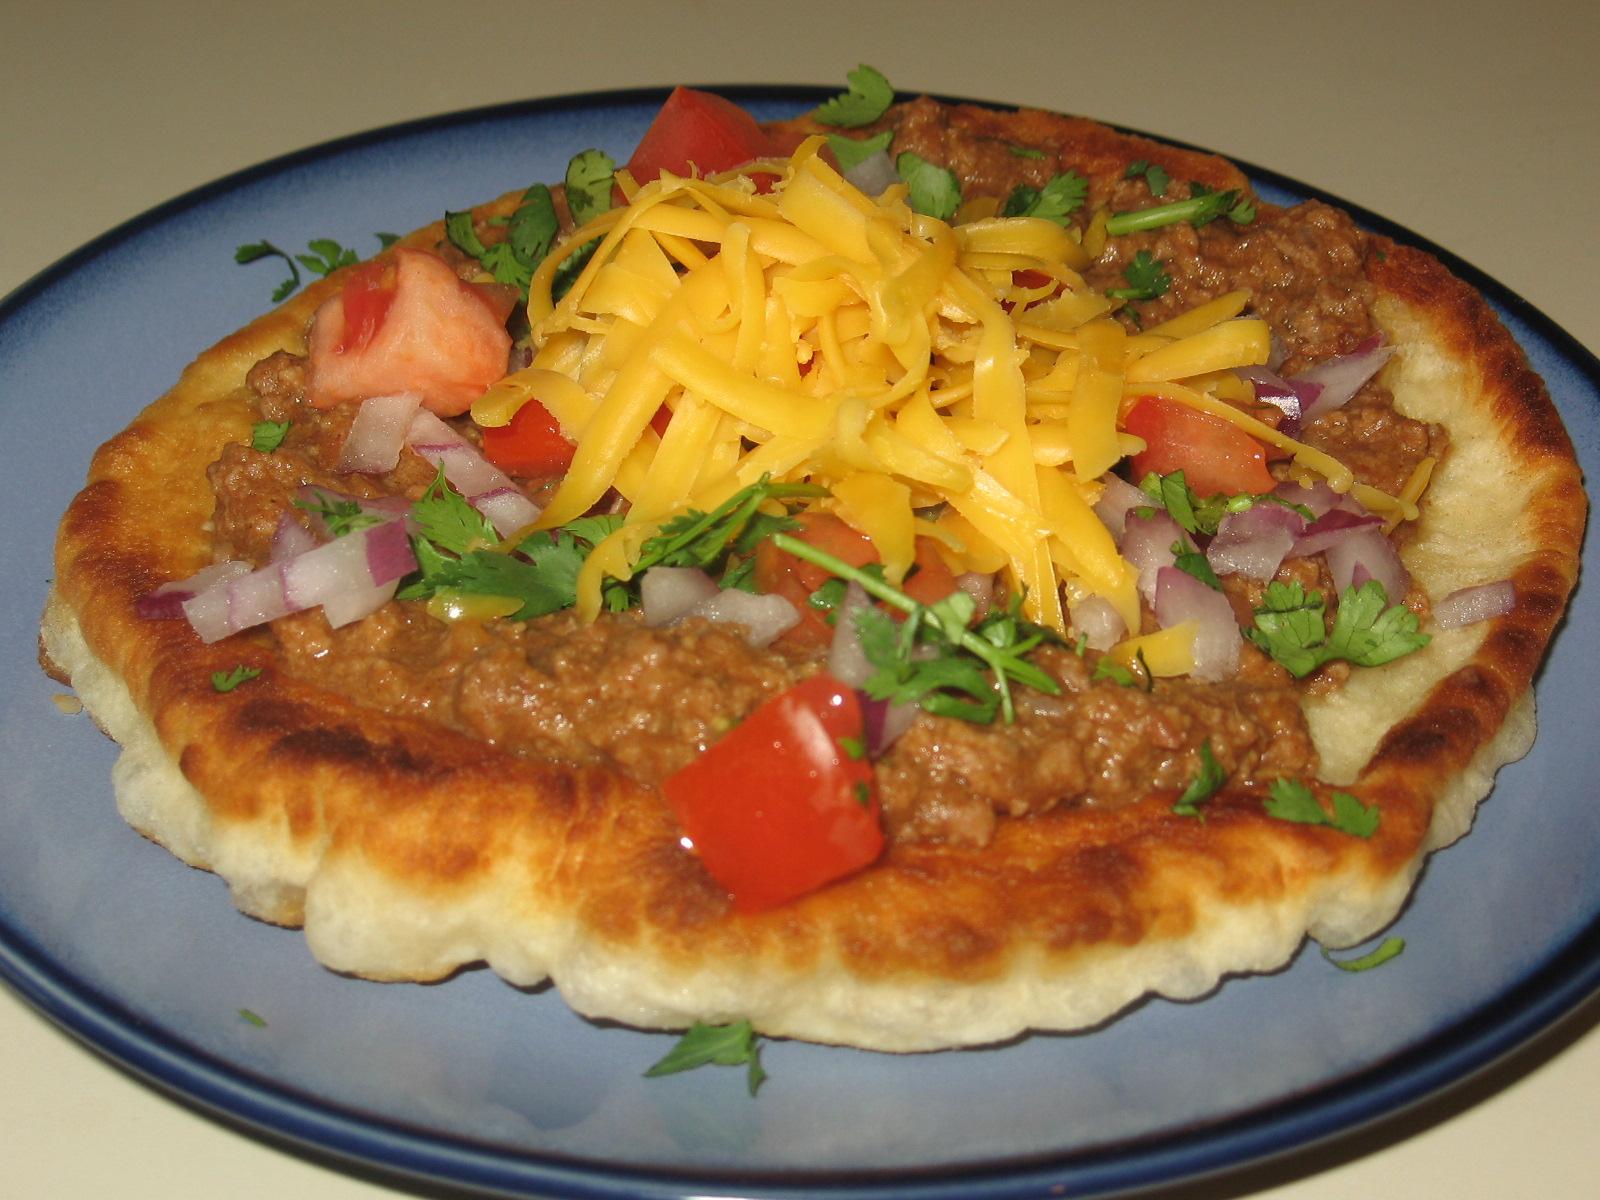 Native american kid friendly recipes genius kitchen forumfinder Choice Image